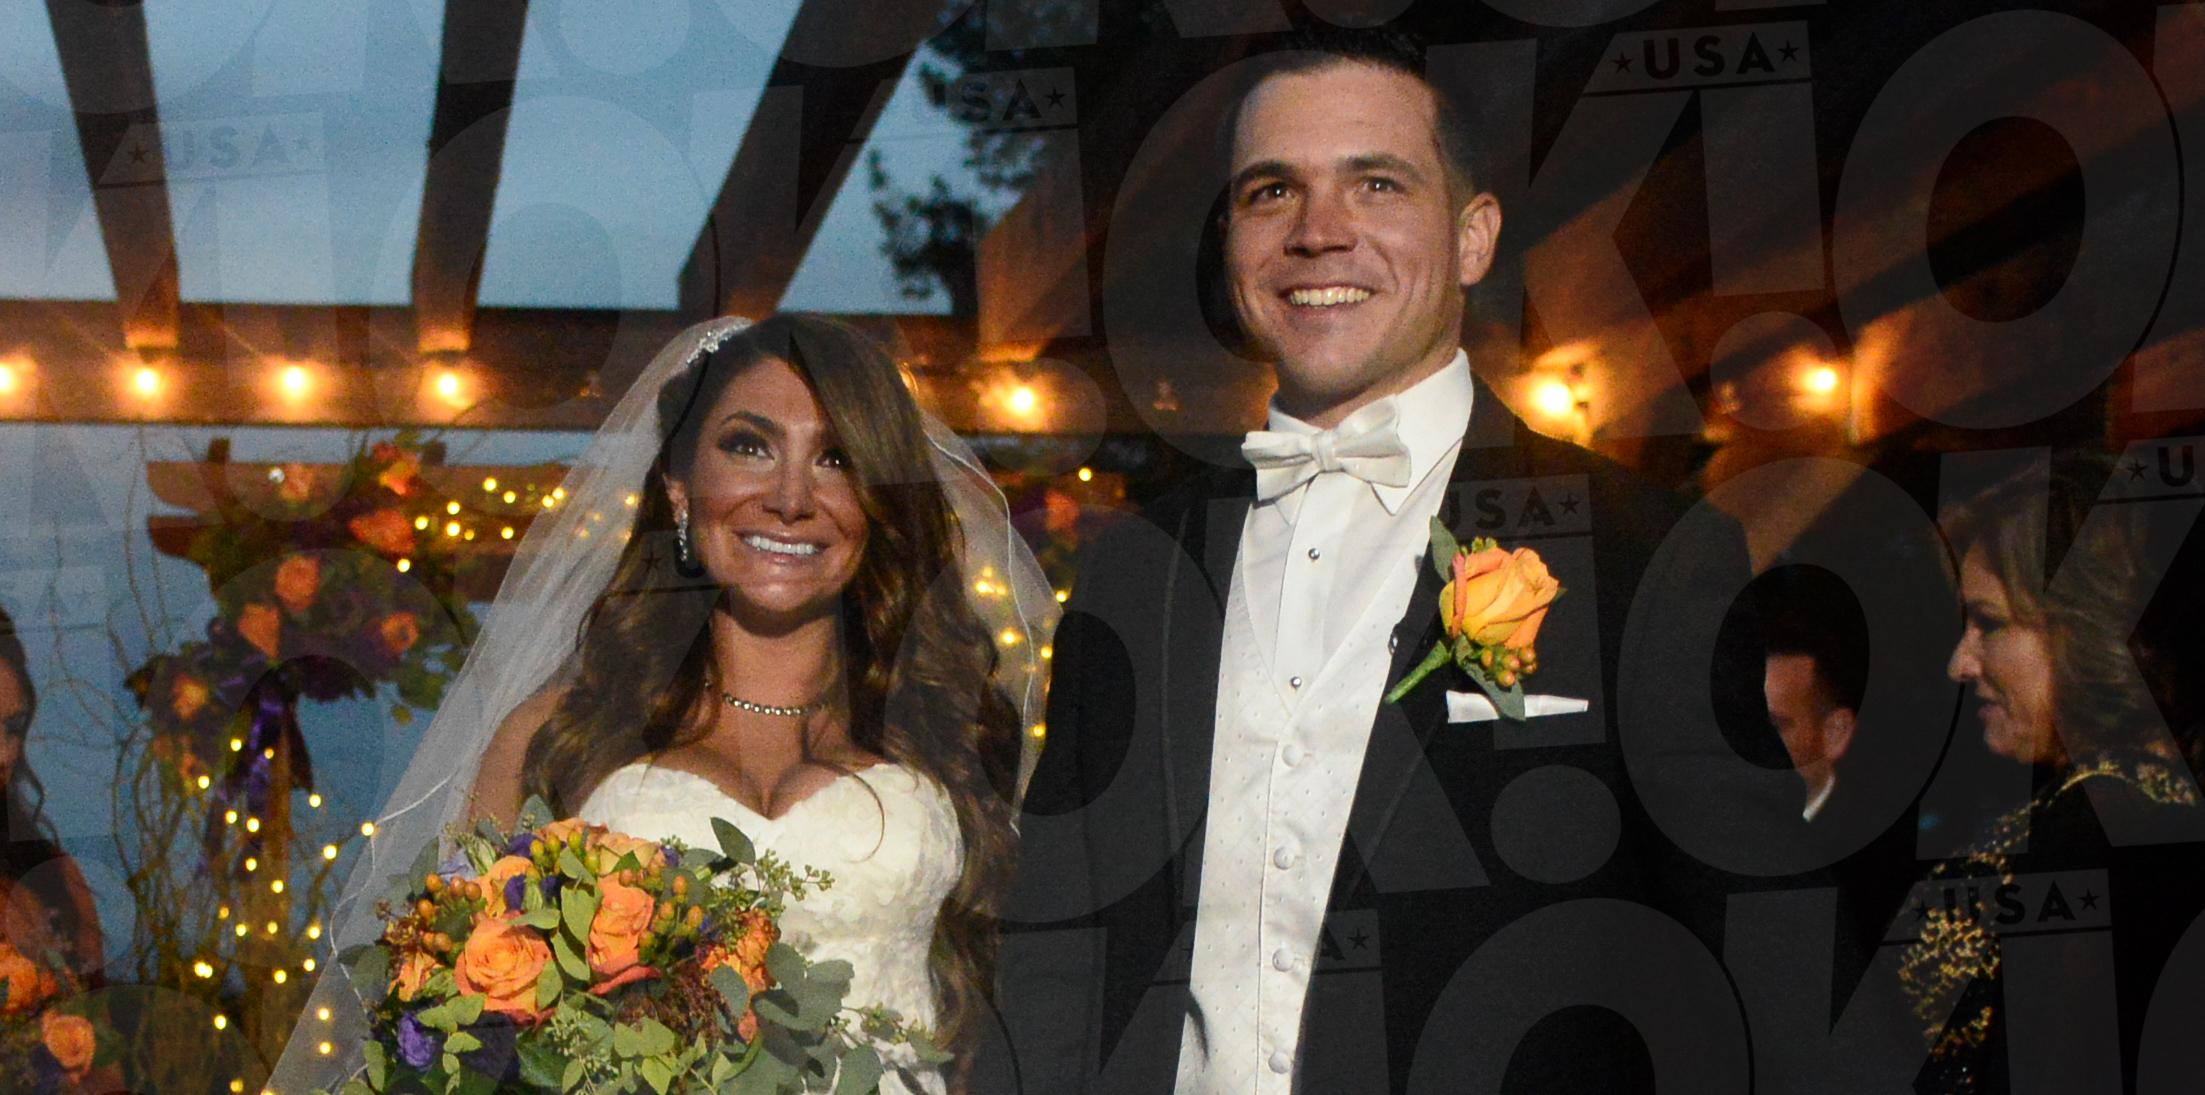 deena cortese wedding chris buckner pics pp